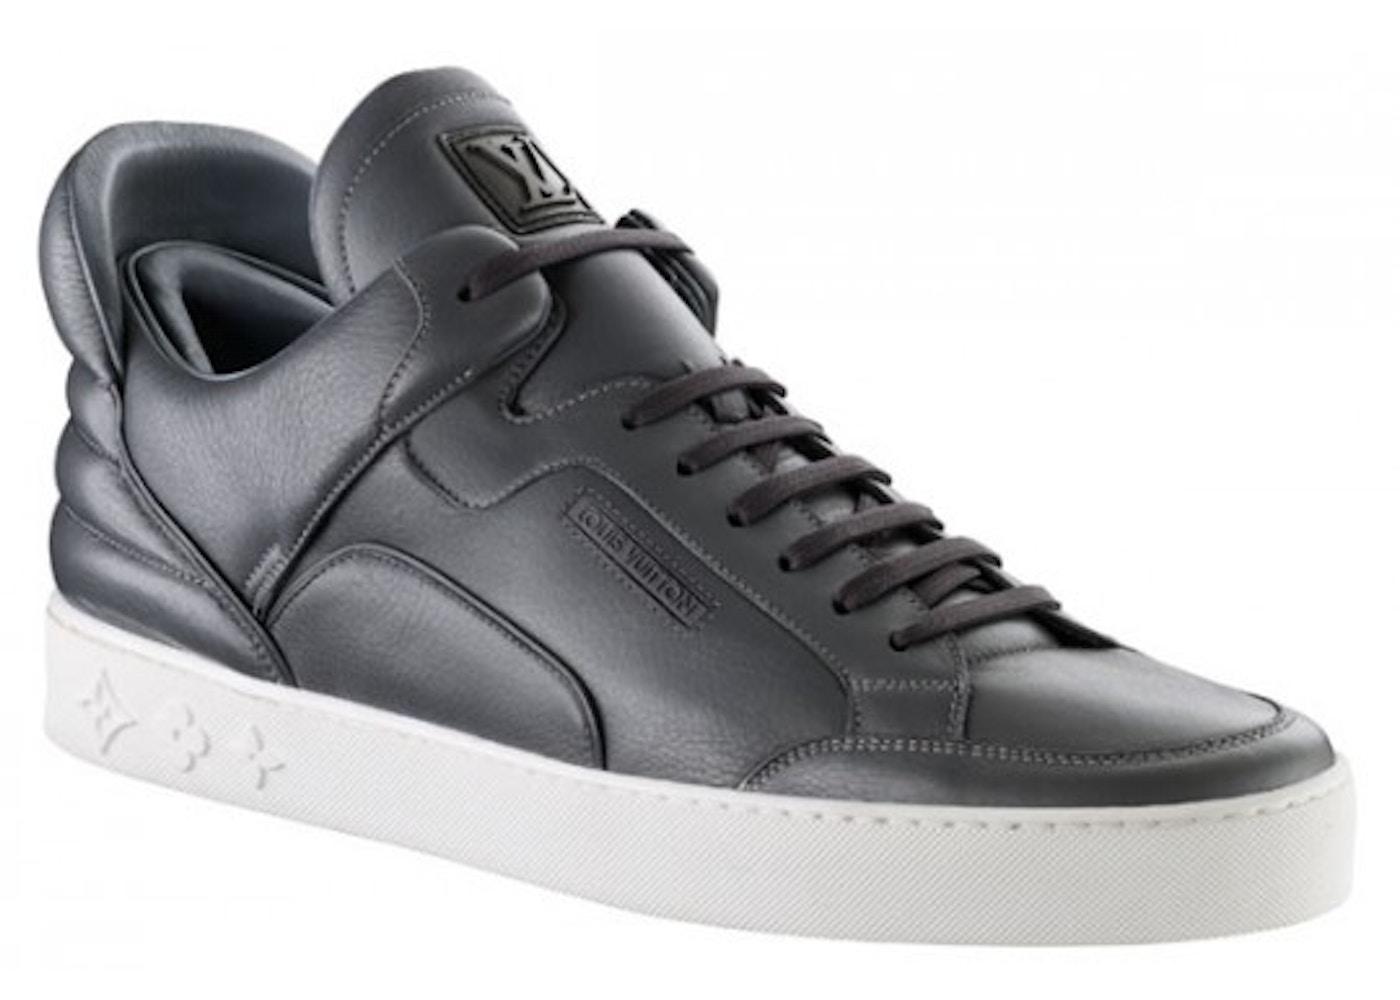 93ddeba31 Sell. or Ask. Size  11.5. View All Bids. Louis Vuitton Don Kanye Black